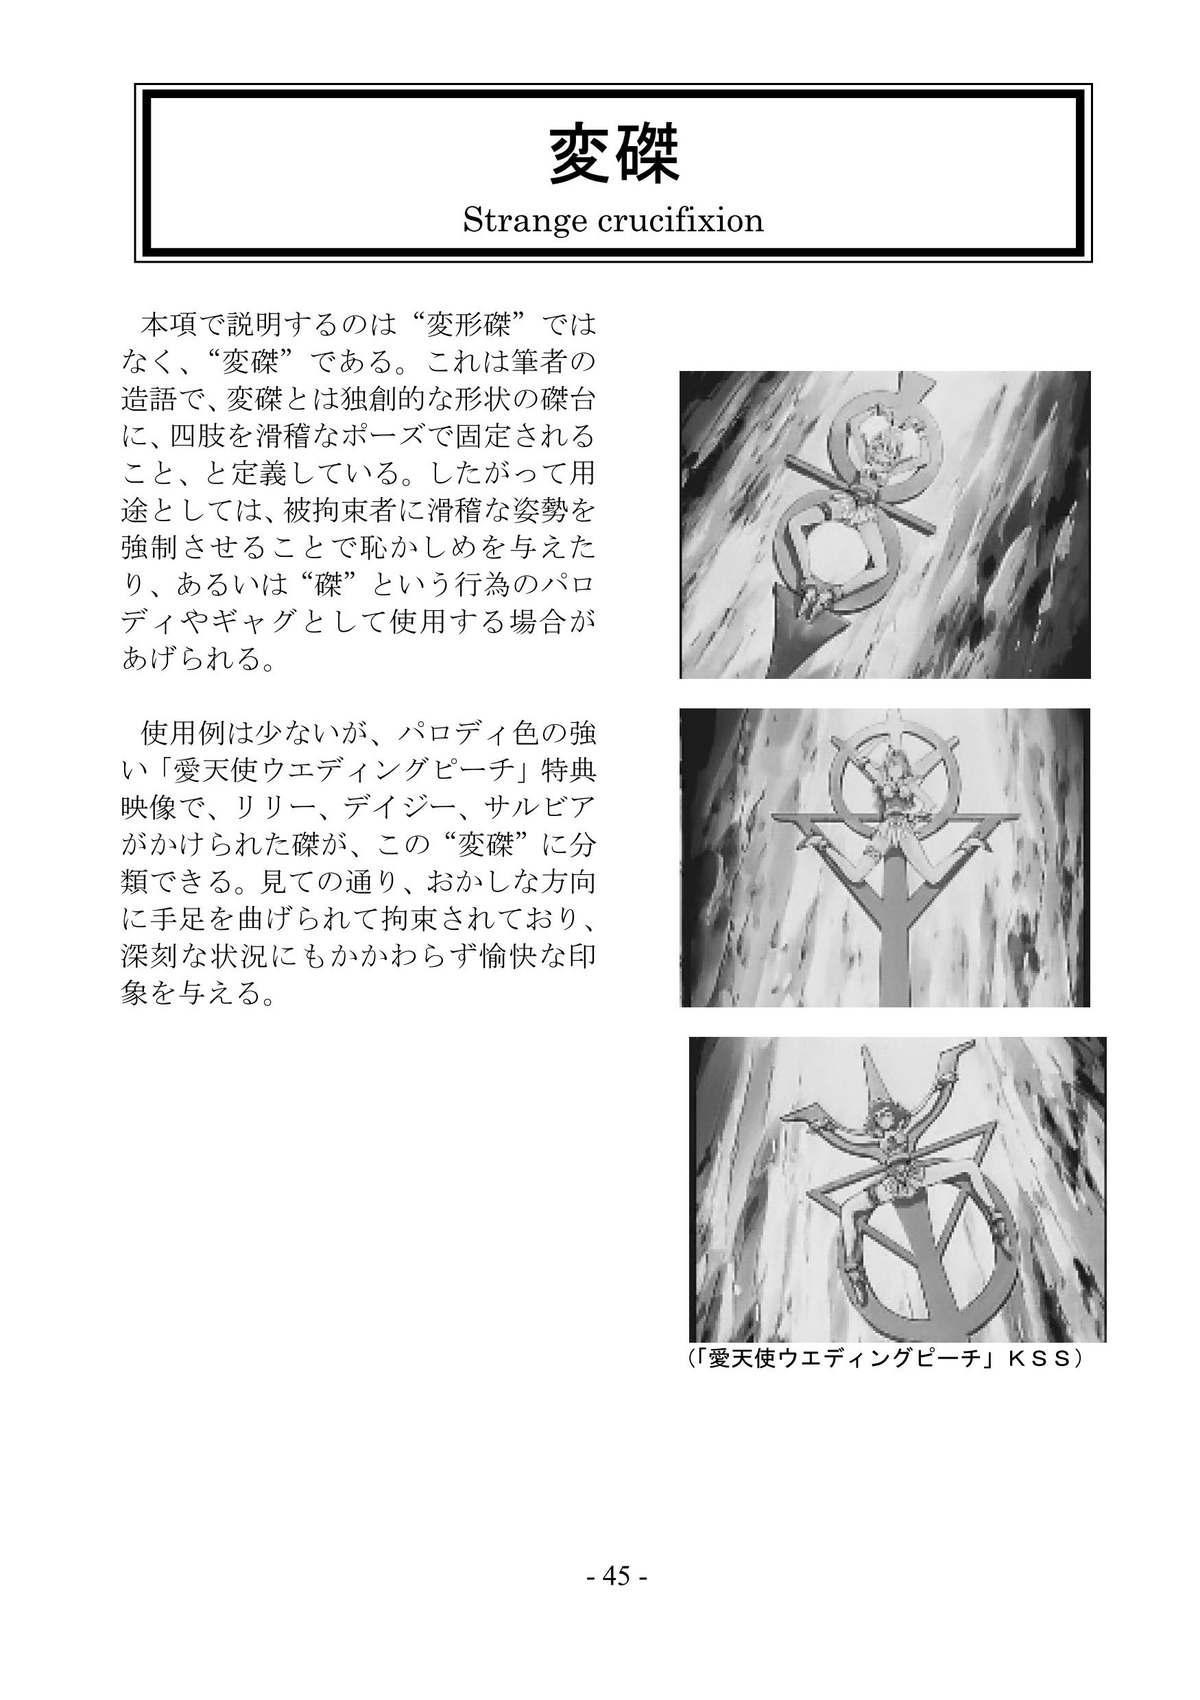 encyclopedia of crucifixion 45